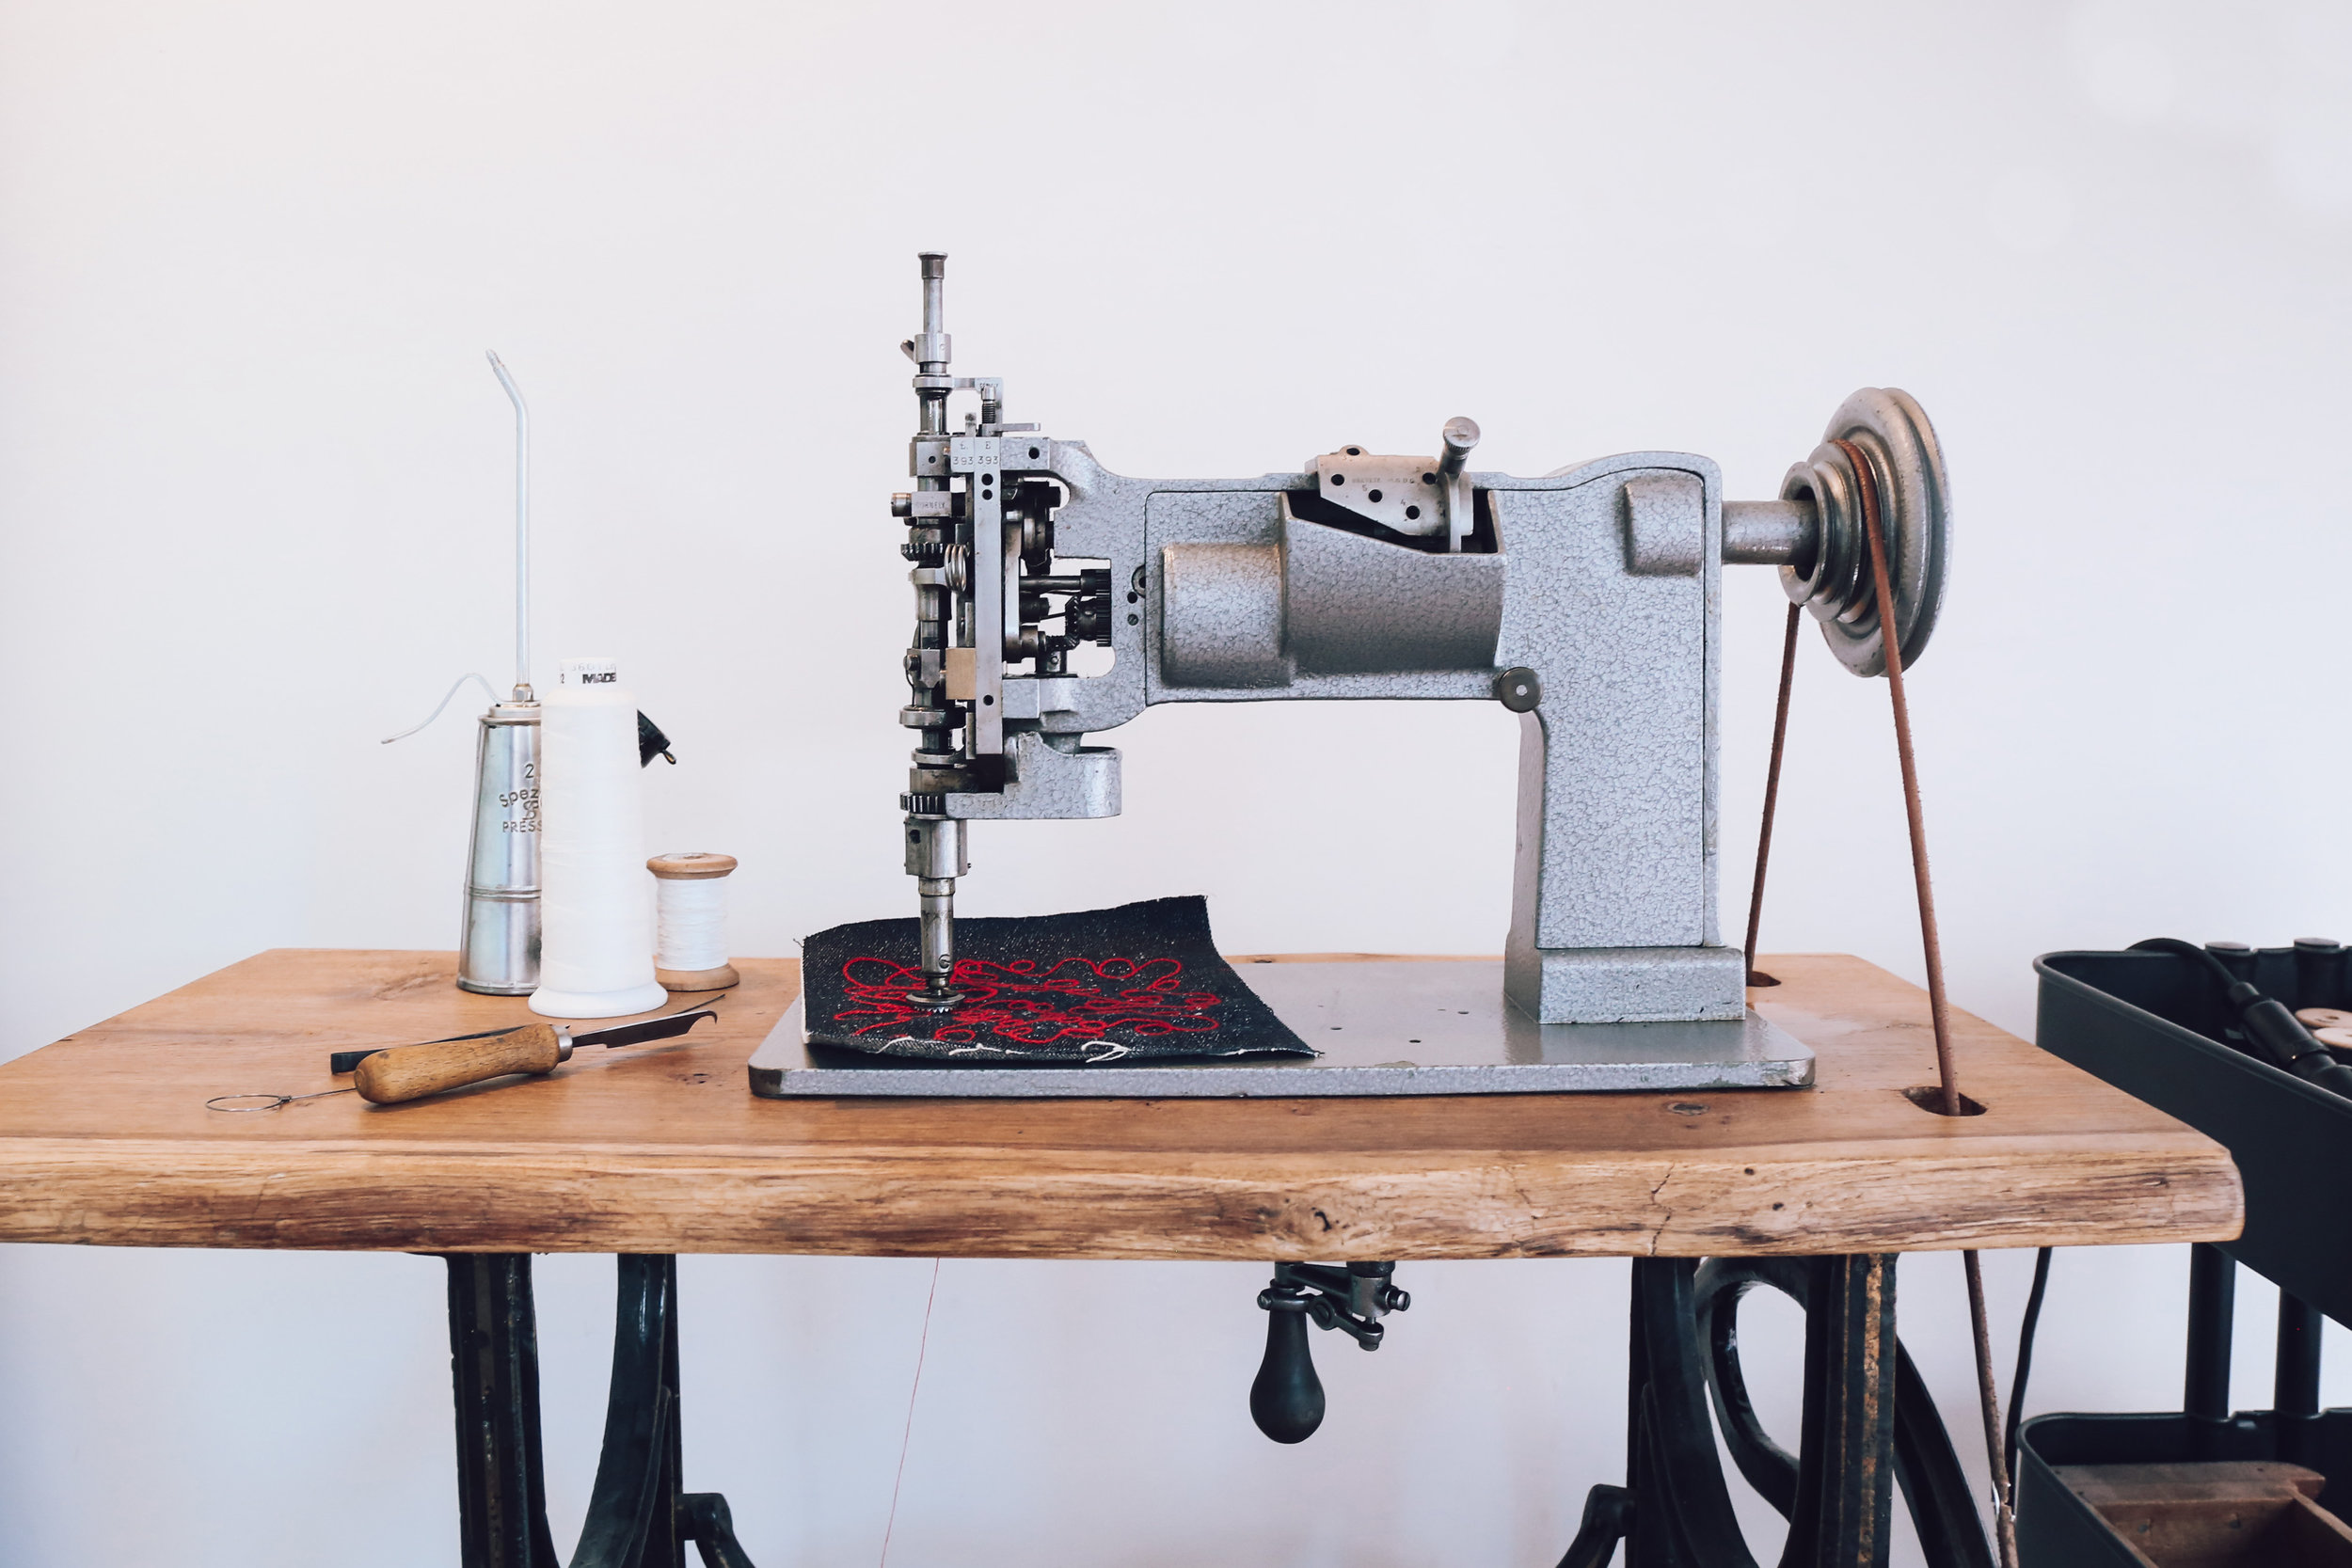 Chain Stitch Machine Cornely LG Saint Chains Chainstitch